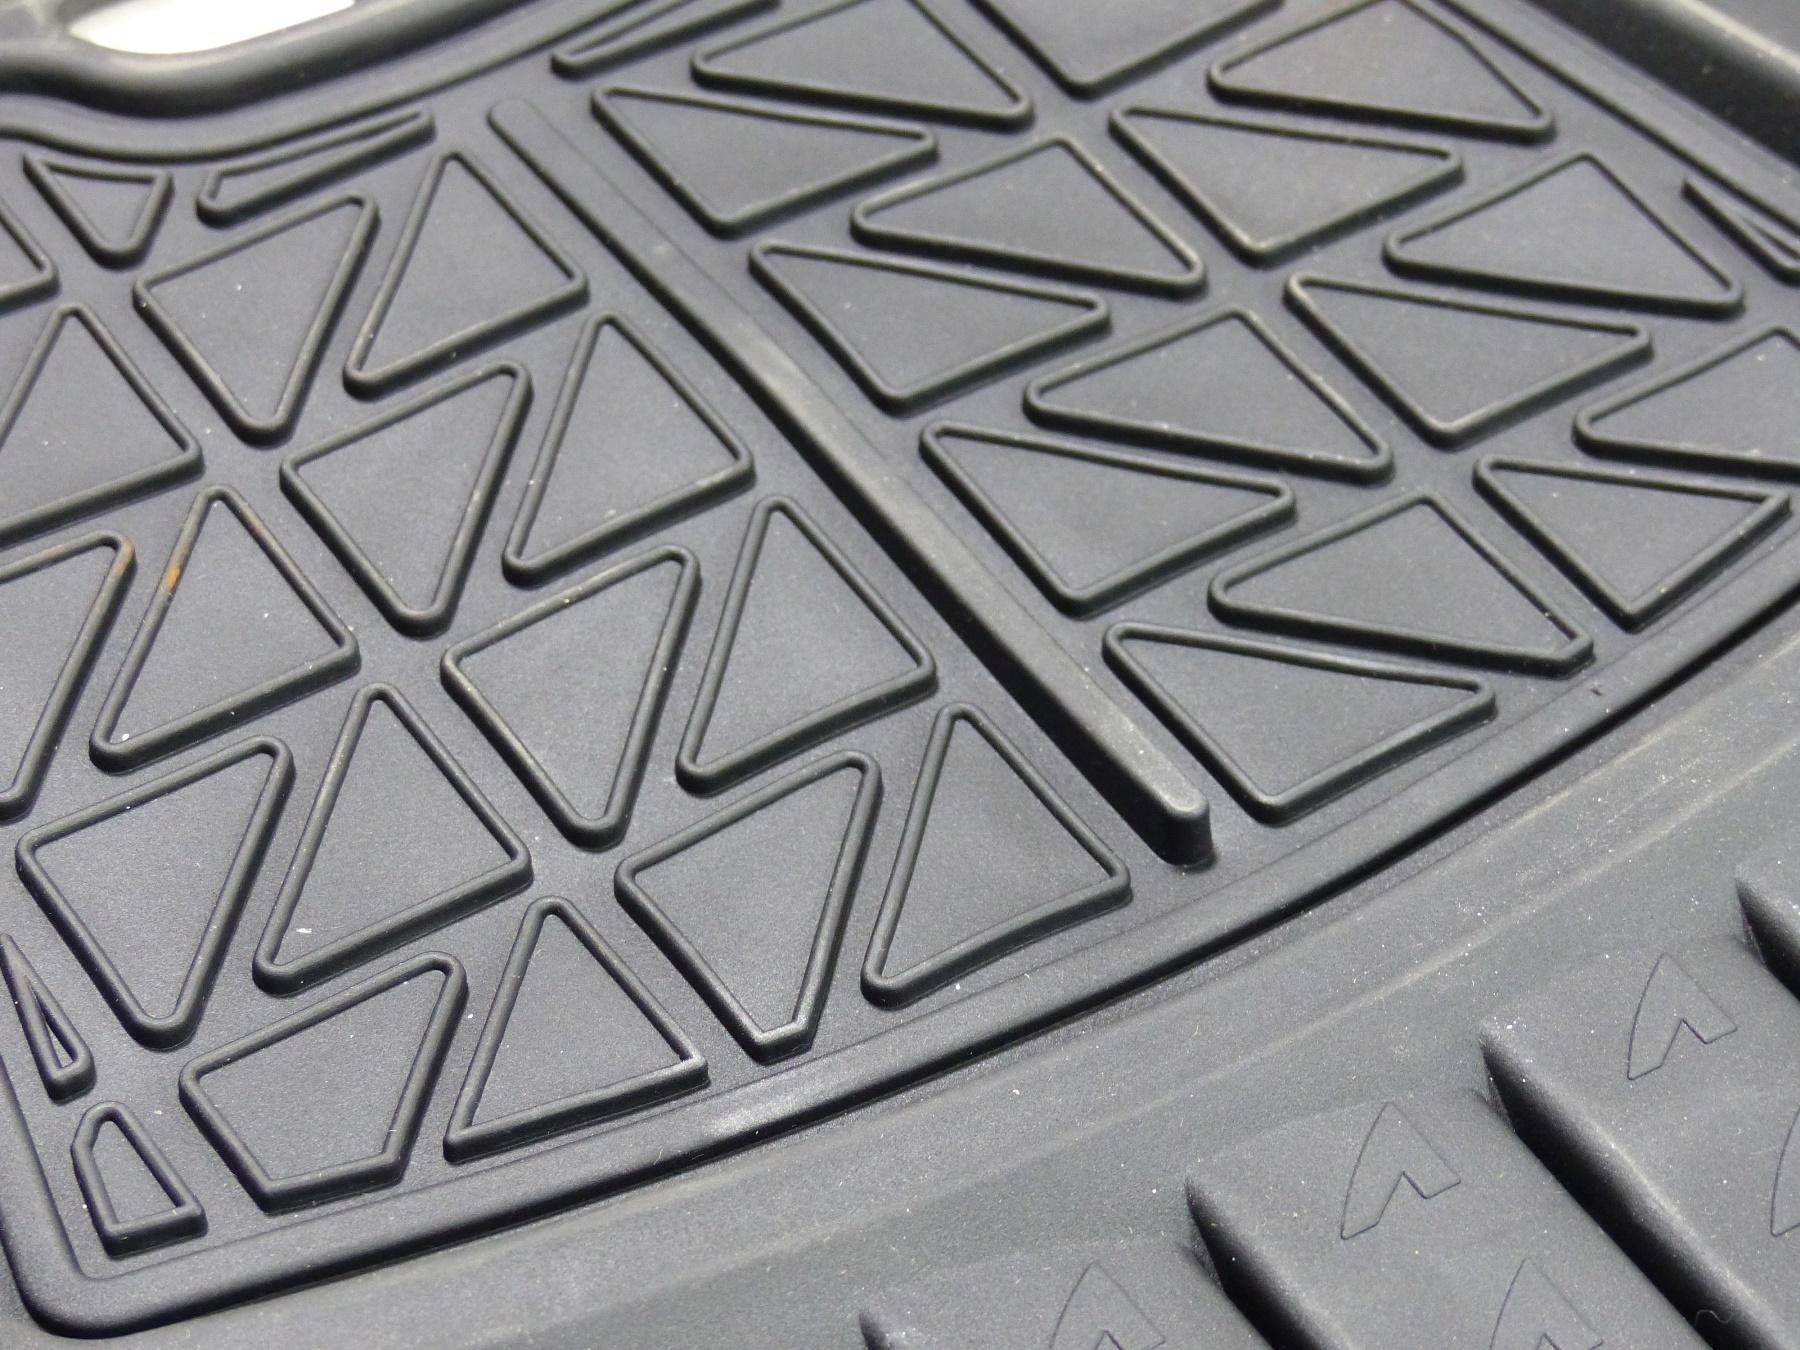 Conjunto de tapete de chão Michelin 009077 3221320090770